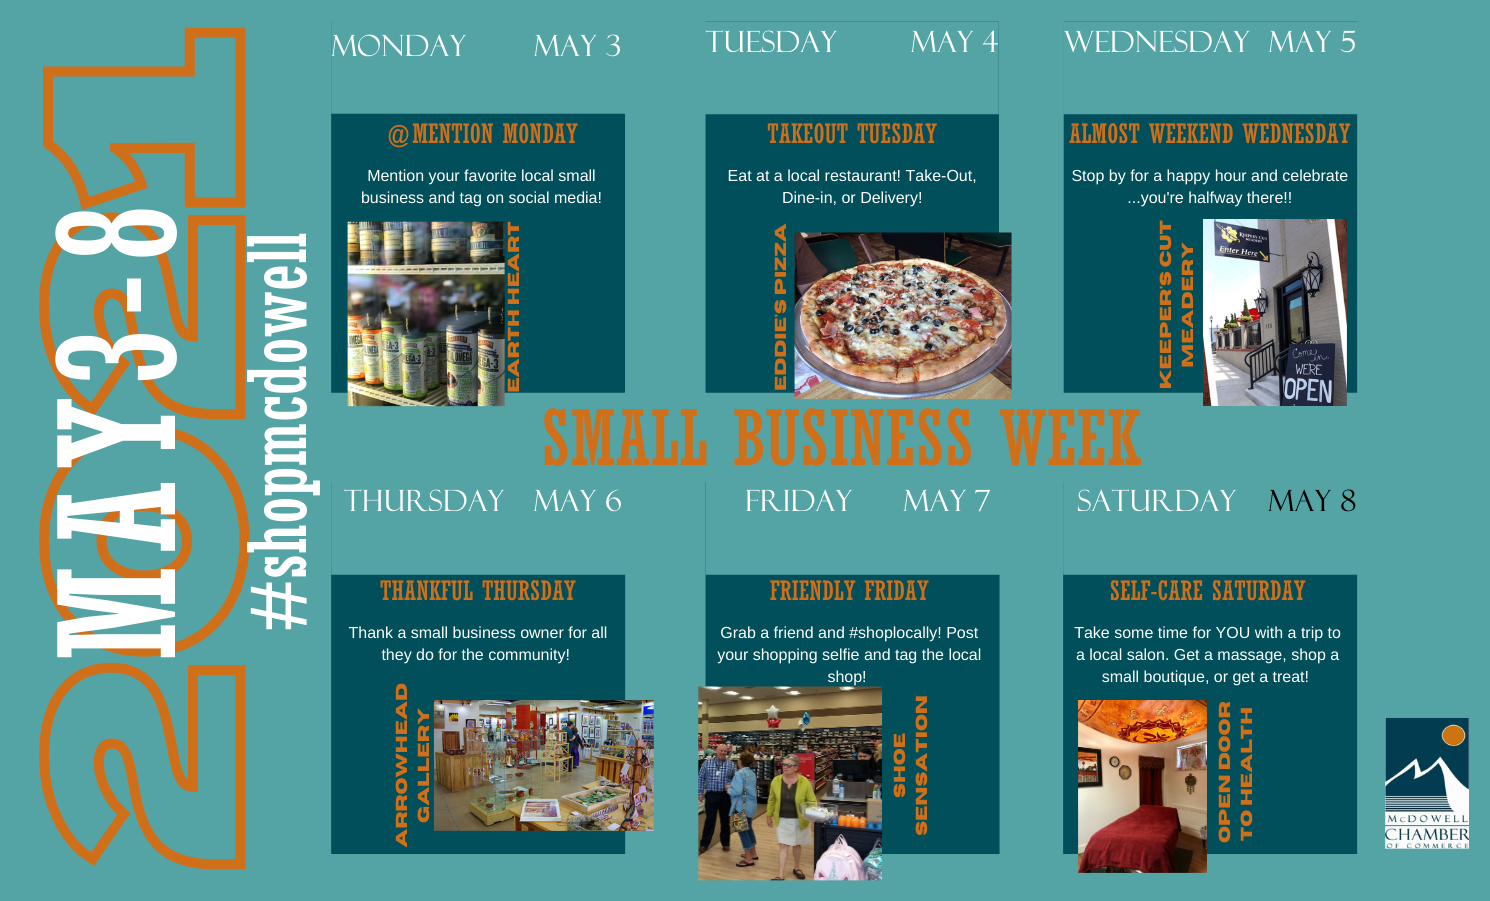 National Small Business Week May 3-9, 2021